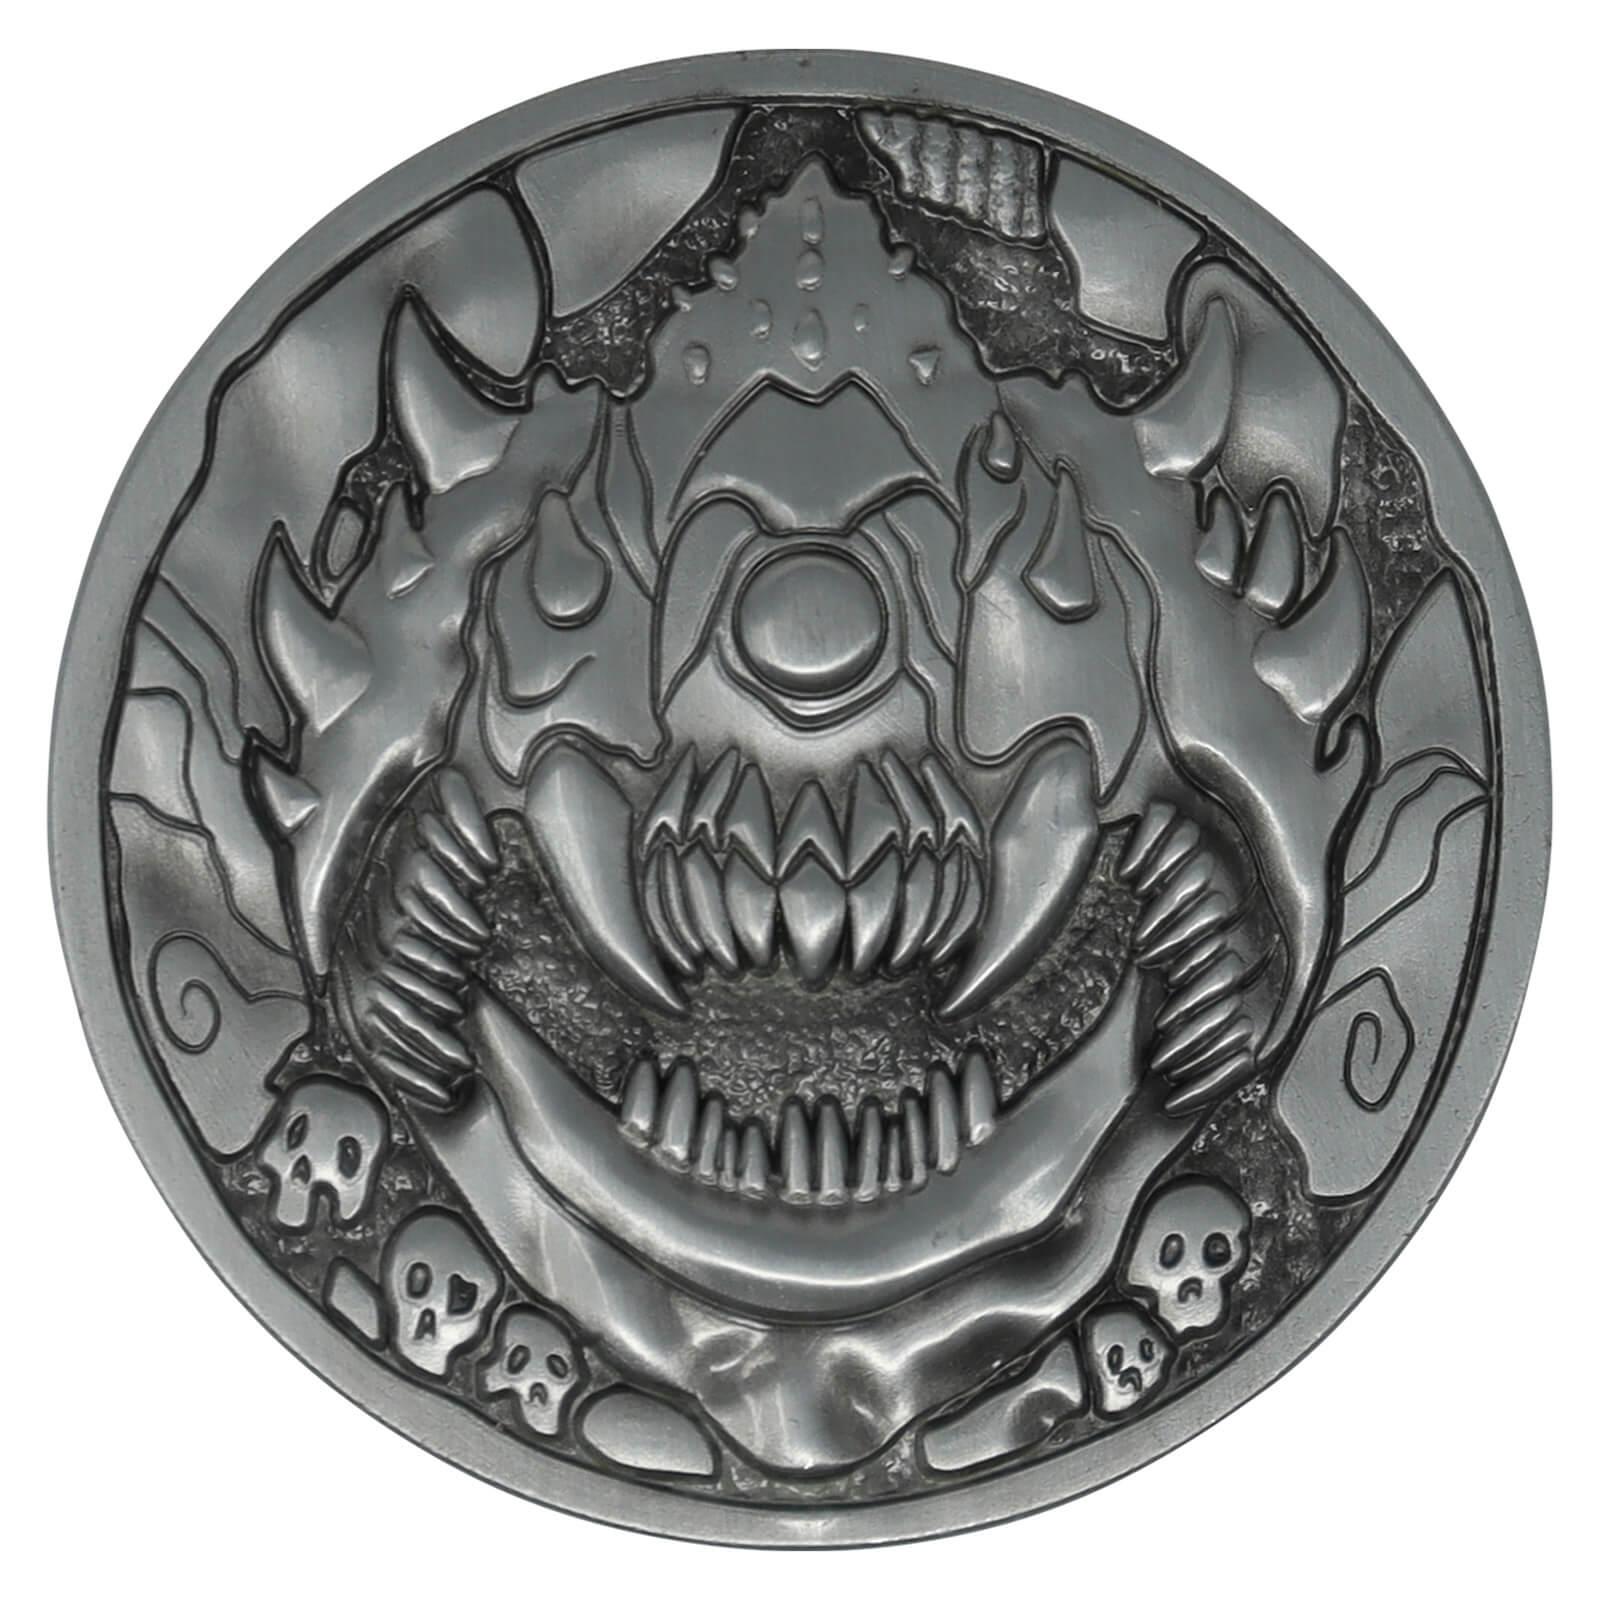 Fanattik Doom Cacodemon Level Up Collectors Medallion